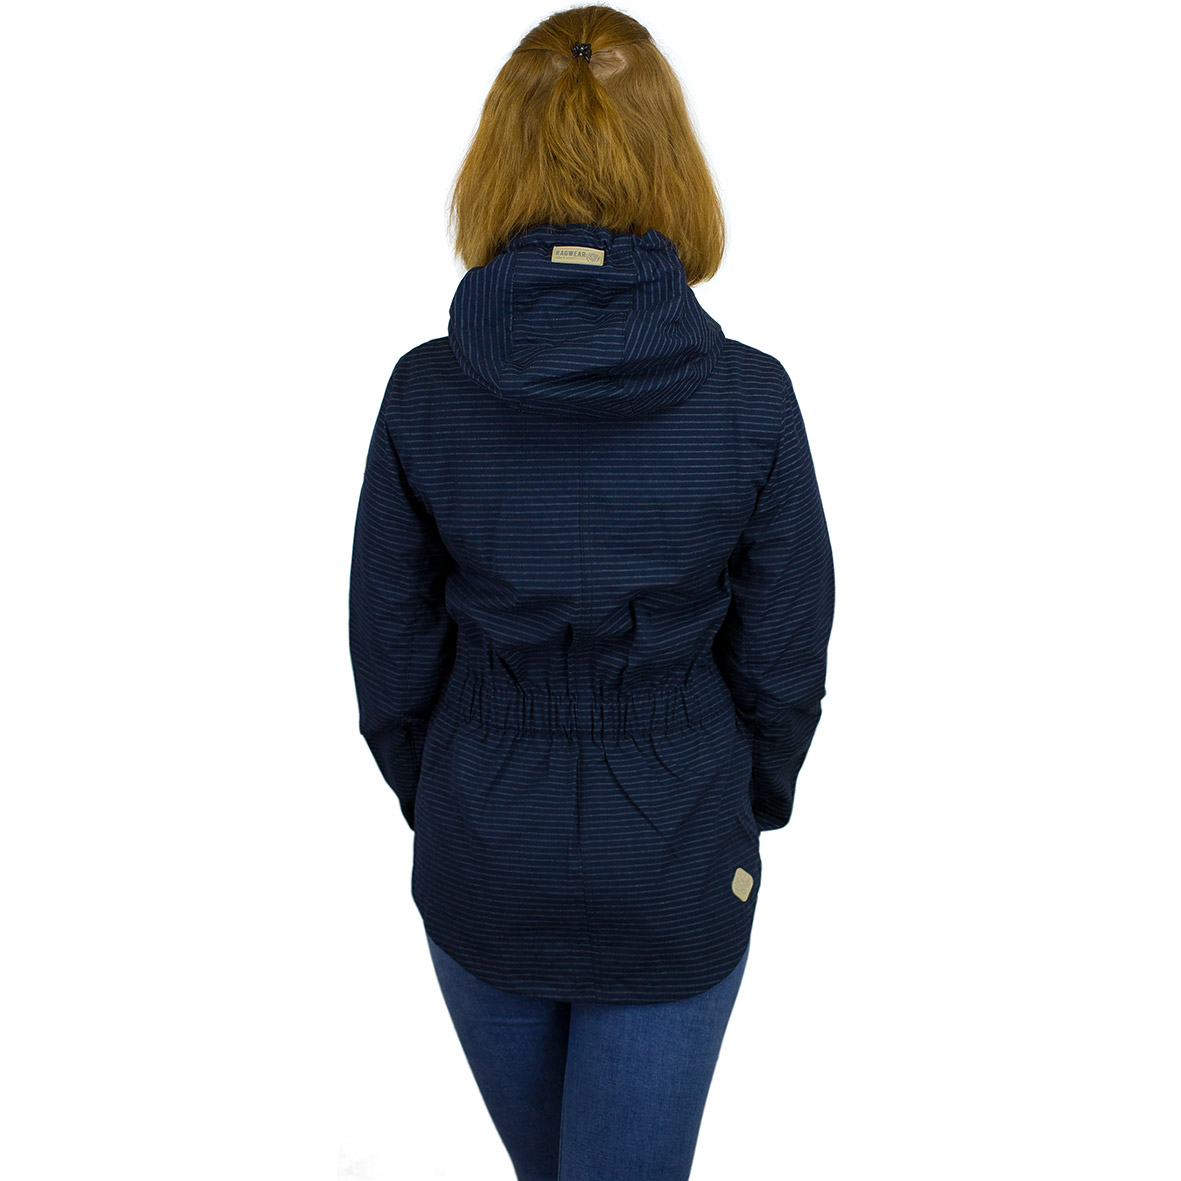 Ragwear Damen Jacke Monade Stripes dunkelblau